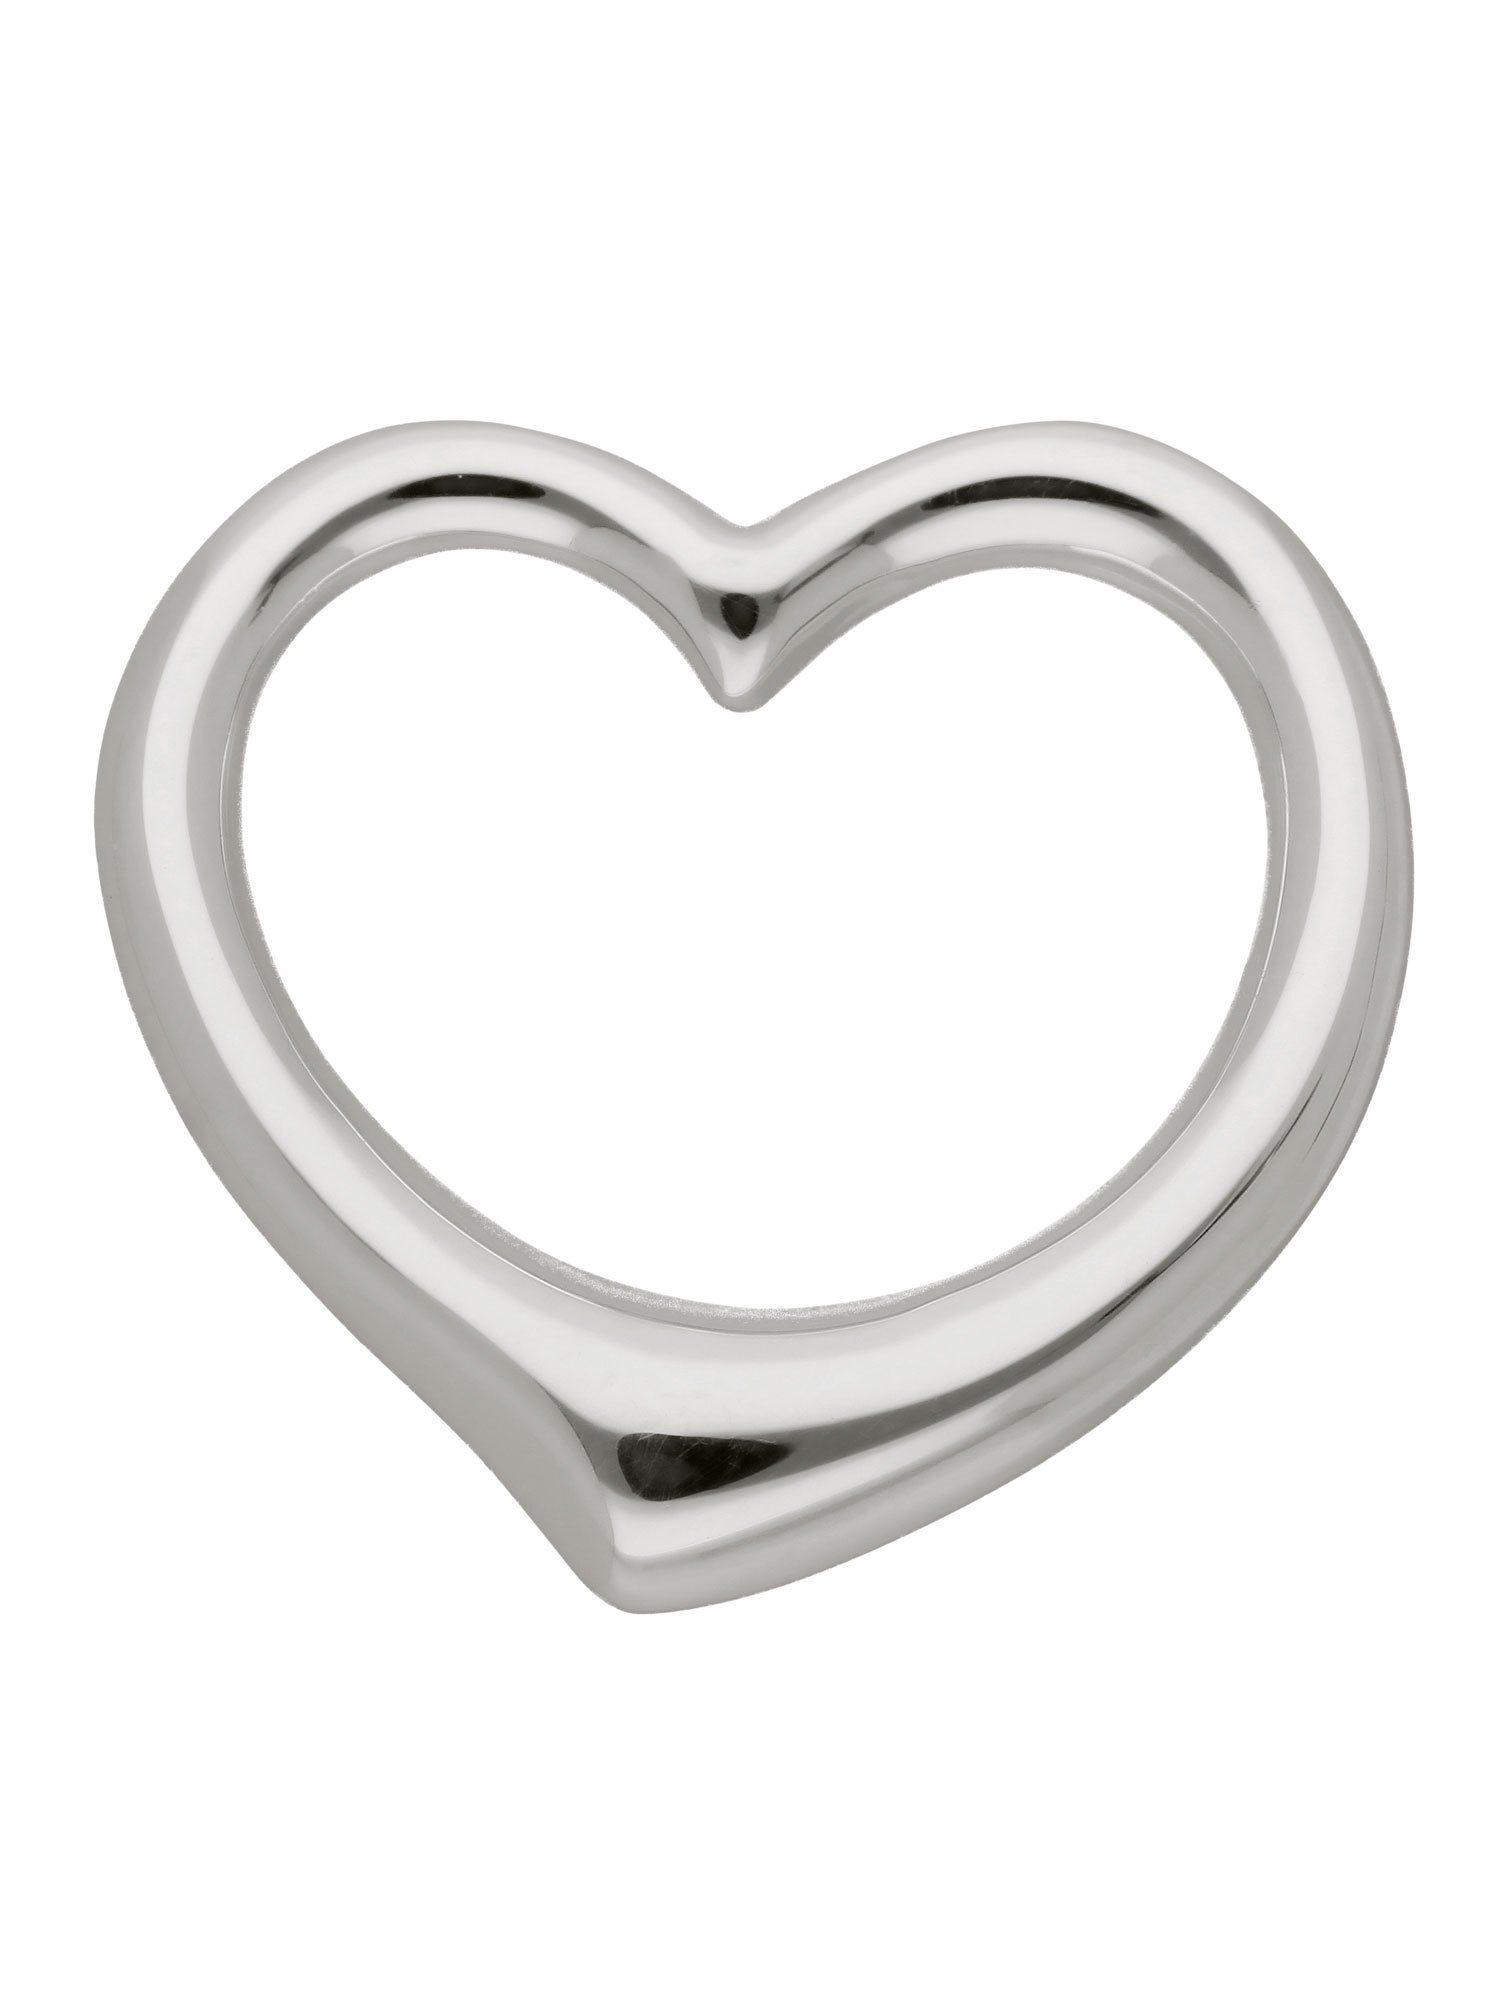 Adelia´s Kettenanhänger »Silber Anhänger« Swingheart 925 Sterling Silber | Schmuck > Halsketten > Ketten ohne Anhänger | Silber | Adelia´s